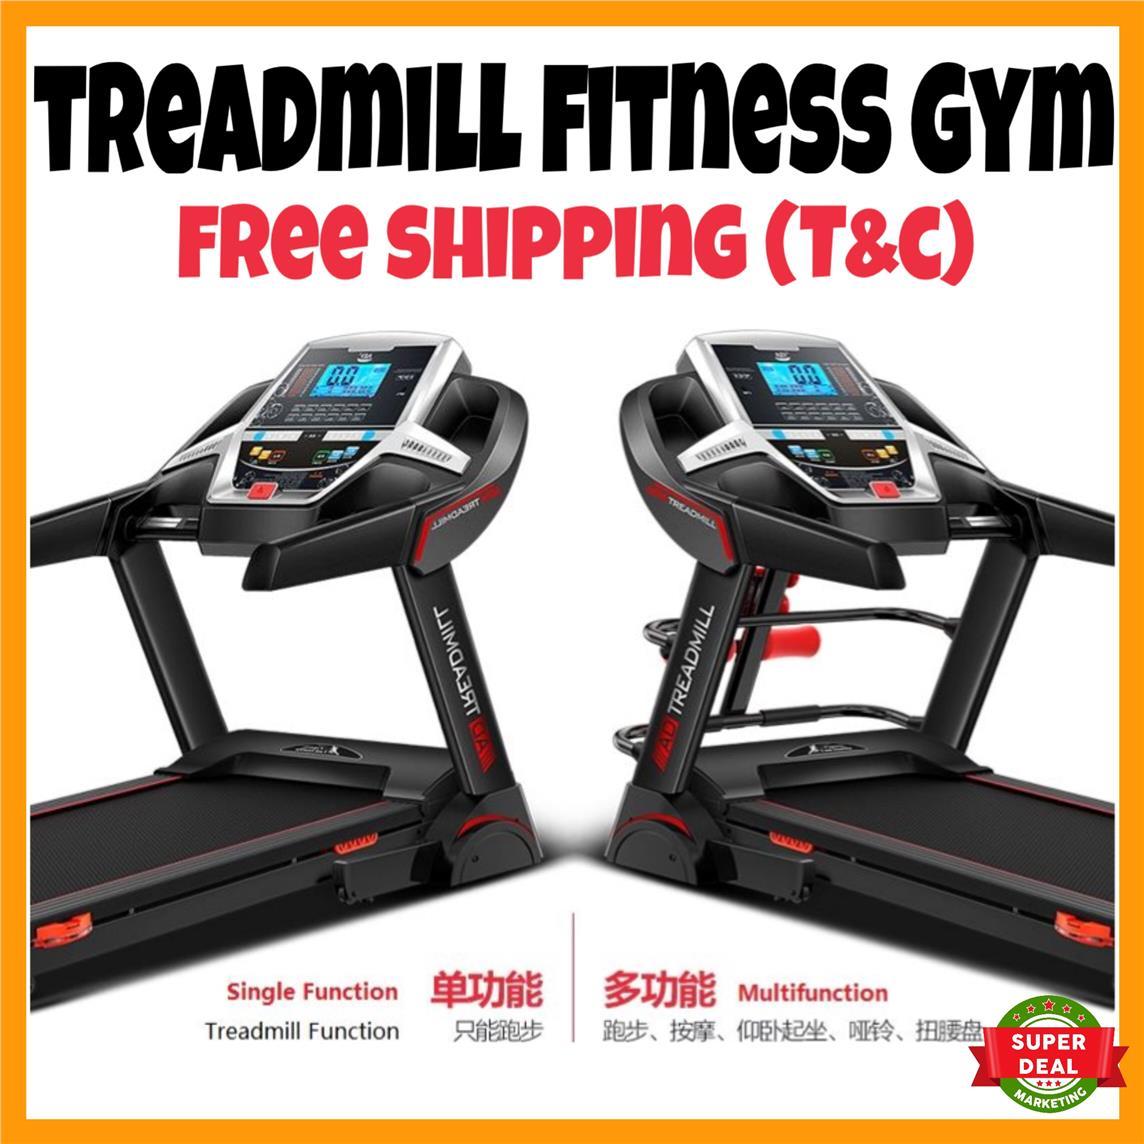 Fitness Equipment Advertisements: PREMIUM AD-A918 Treadmill Home Fitnes (end 7/9/2019 1:15 AM